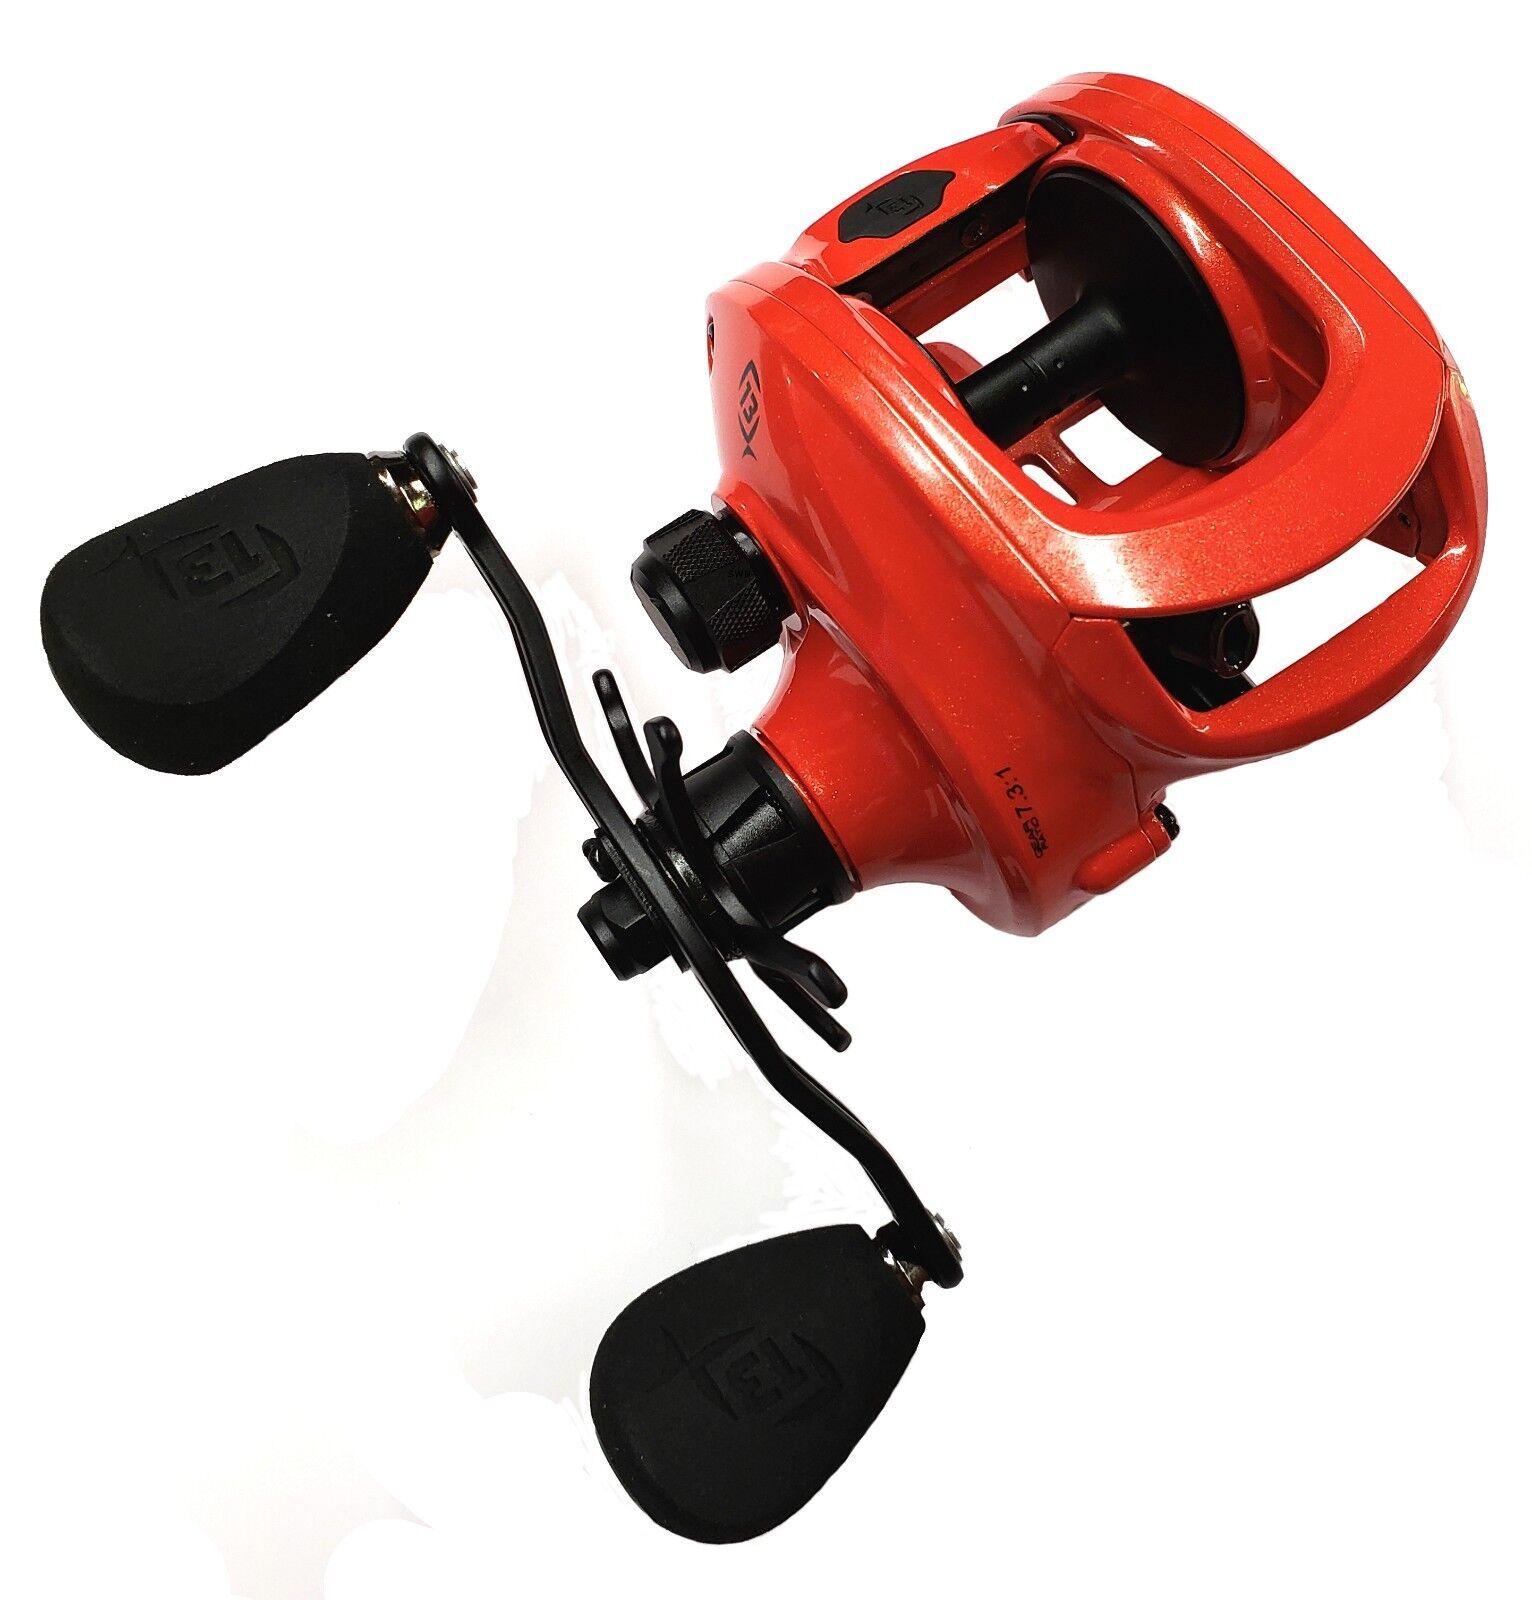 13 Fishing Concept Concept Concept Z3 7.3:1 Bait Casting Fishing Reel (Choose Model) 560dba